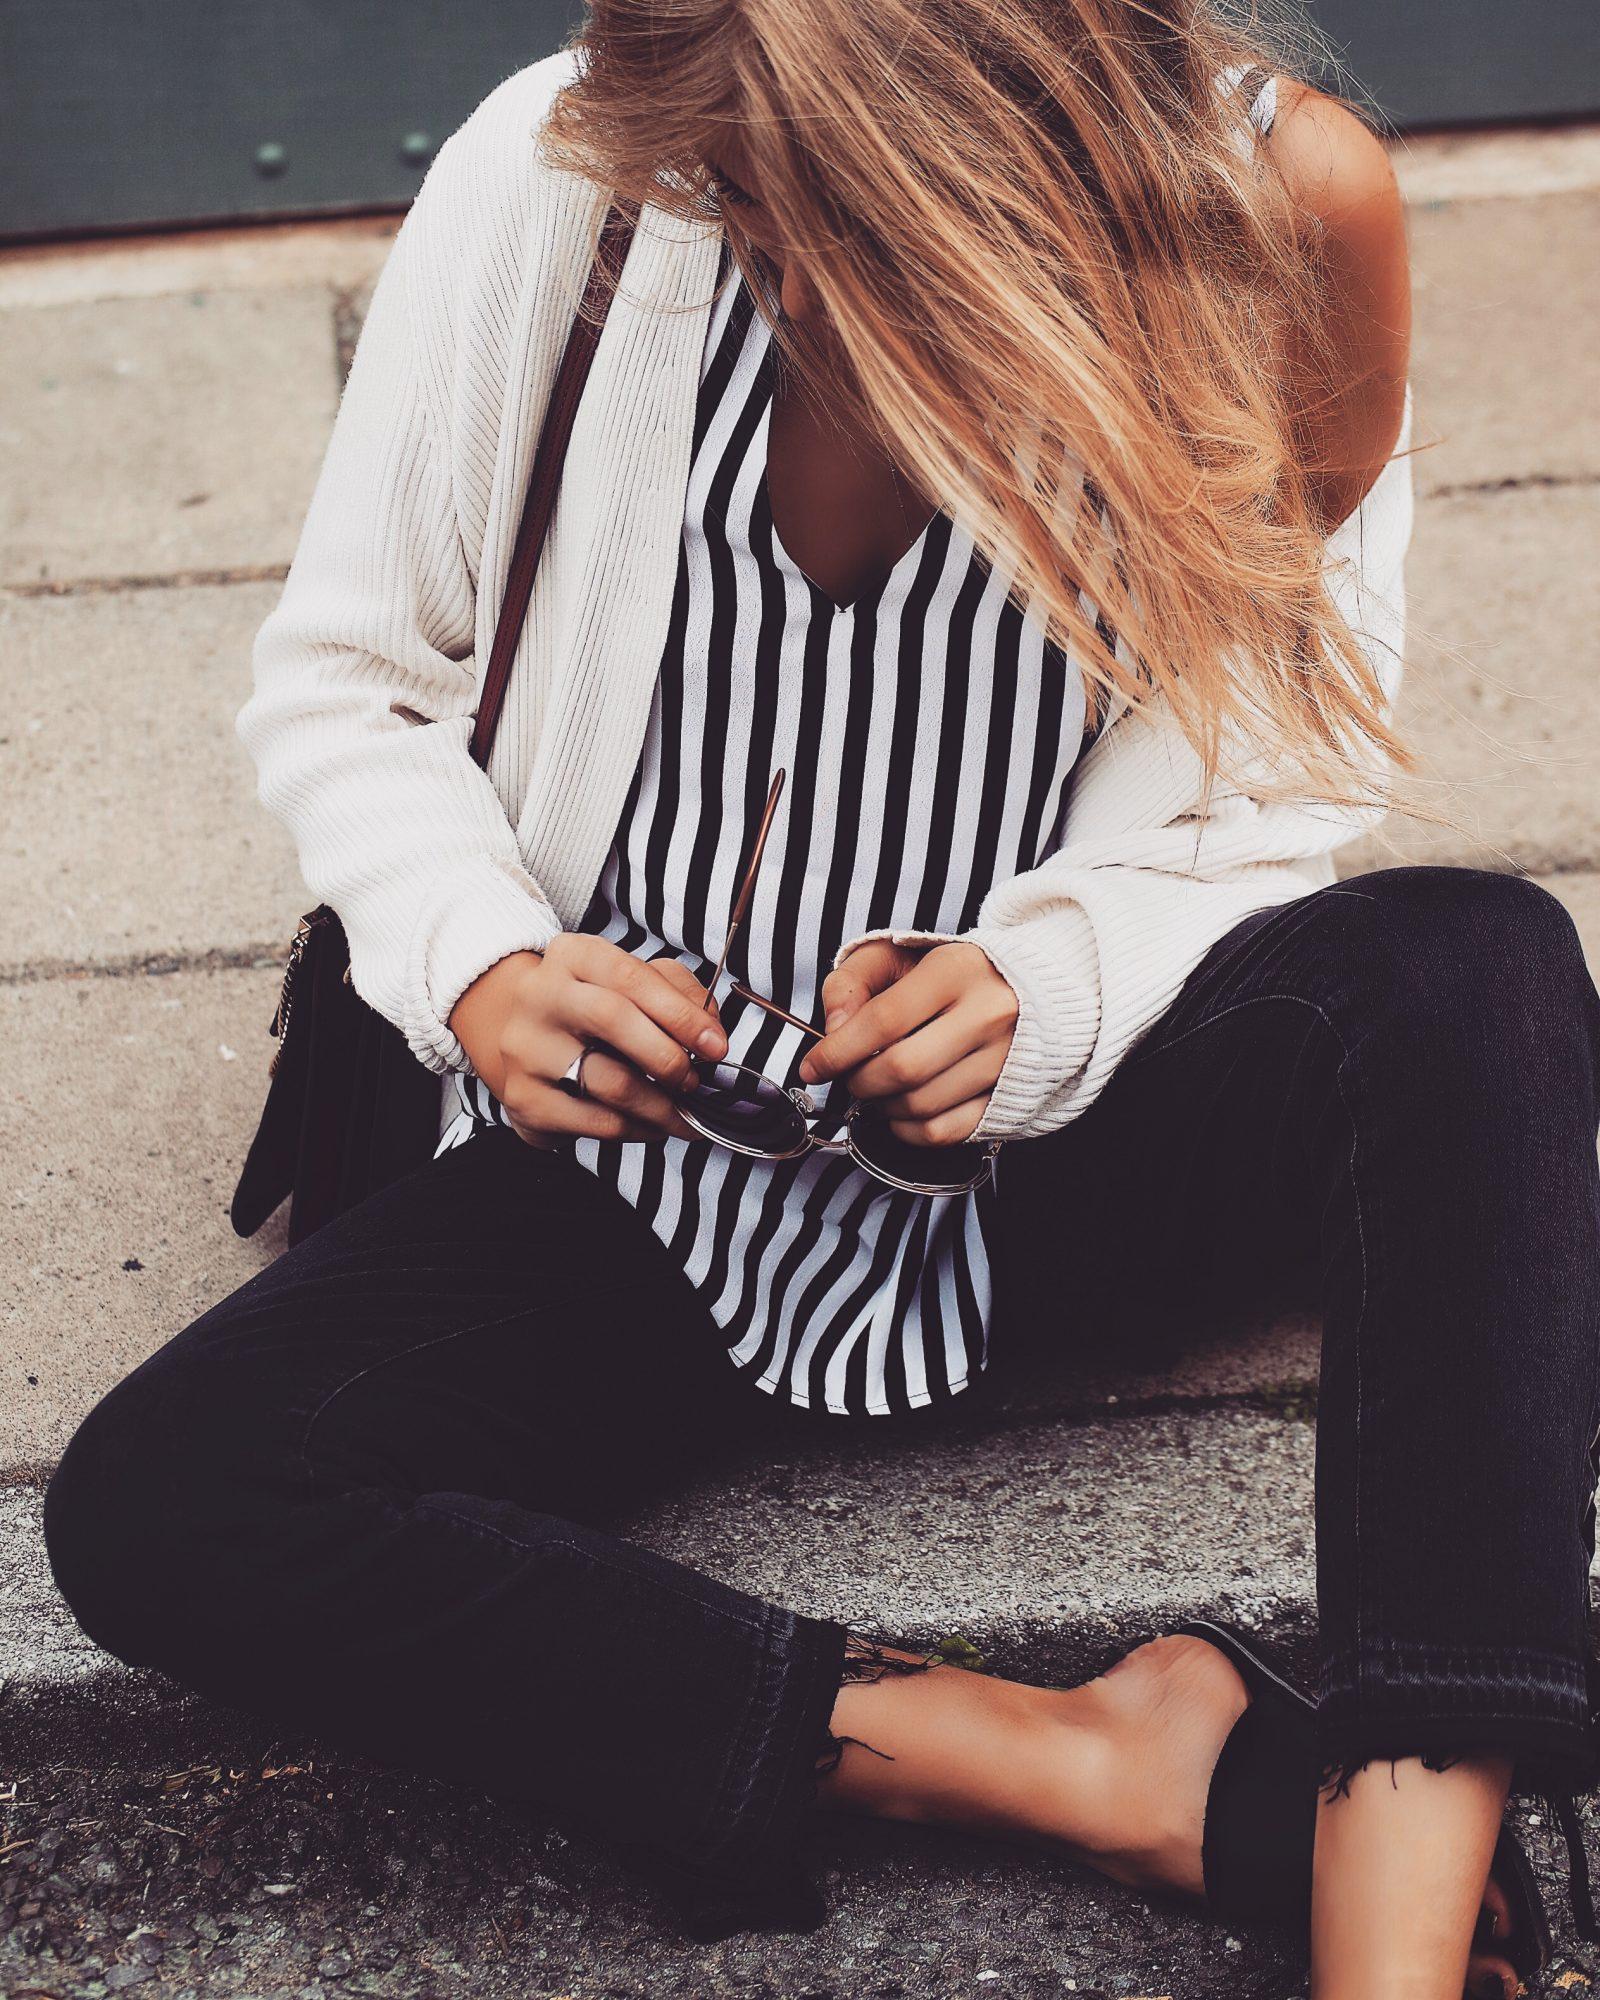 Monochrome Summer Outfit - Monochrome Striped Cami